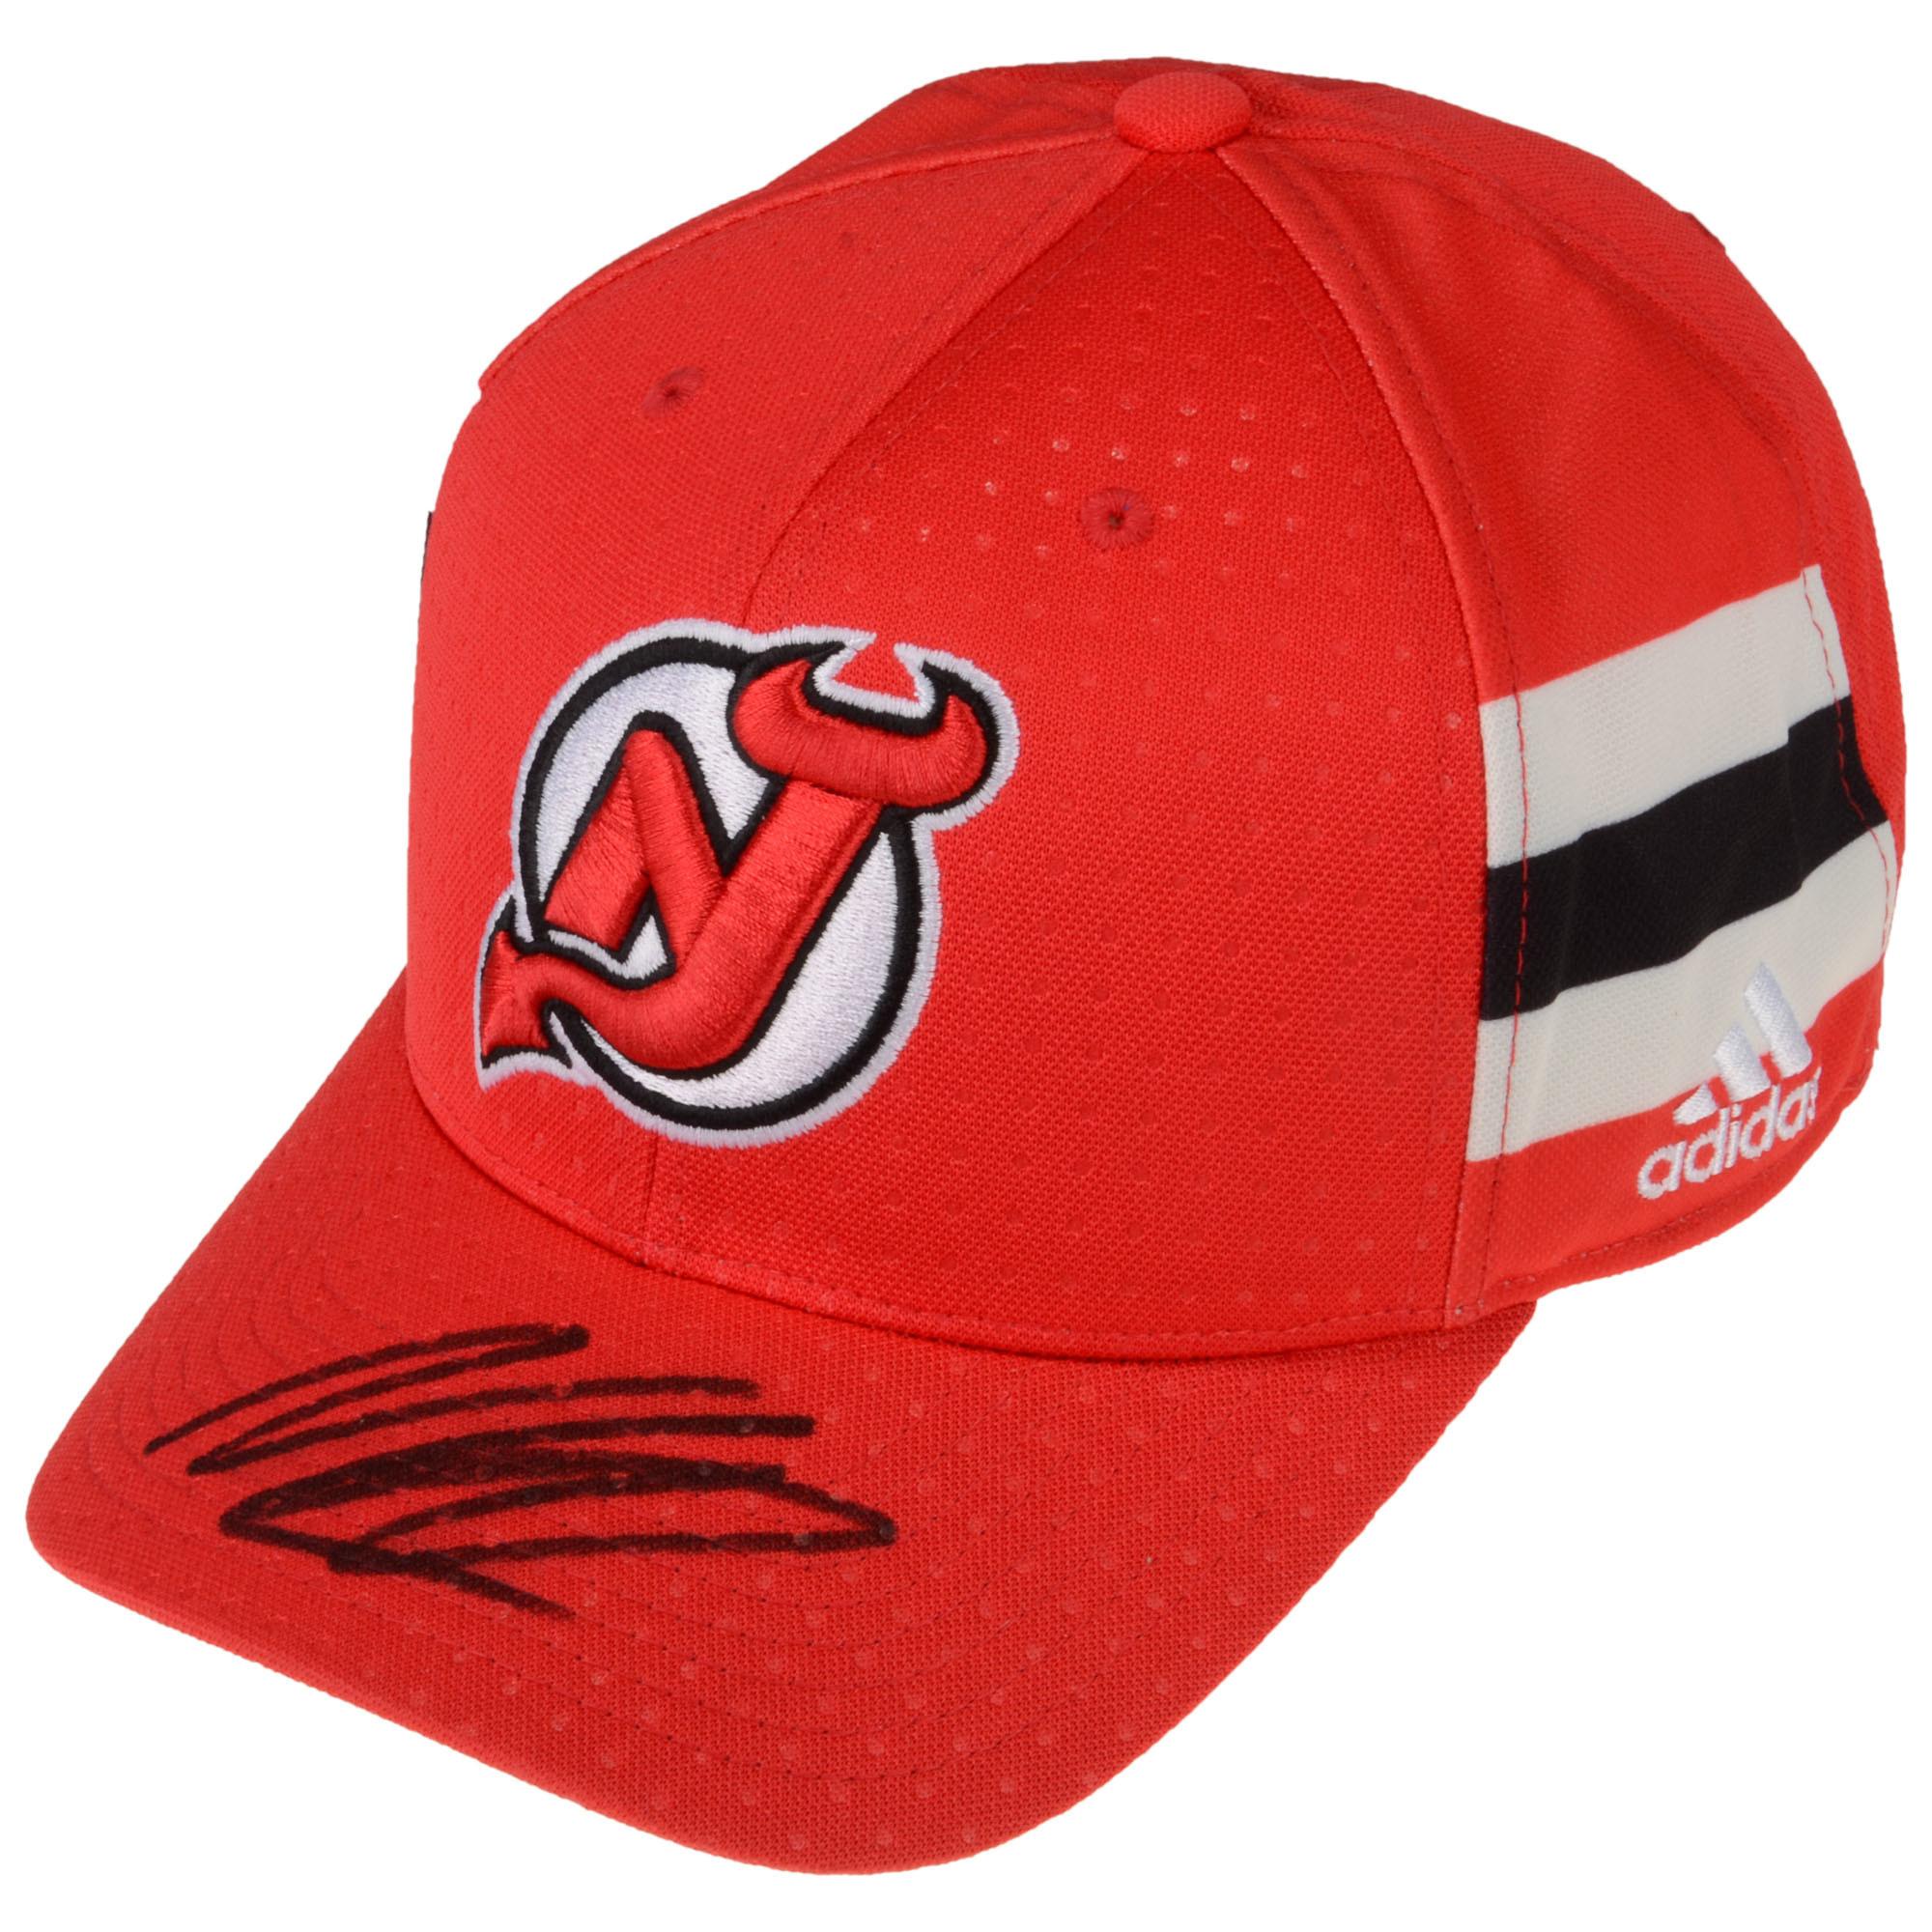 Fanatics Authentic Nico Hischier New Jersey Devils Autographed 2017 NHL  Draft Cap